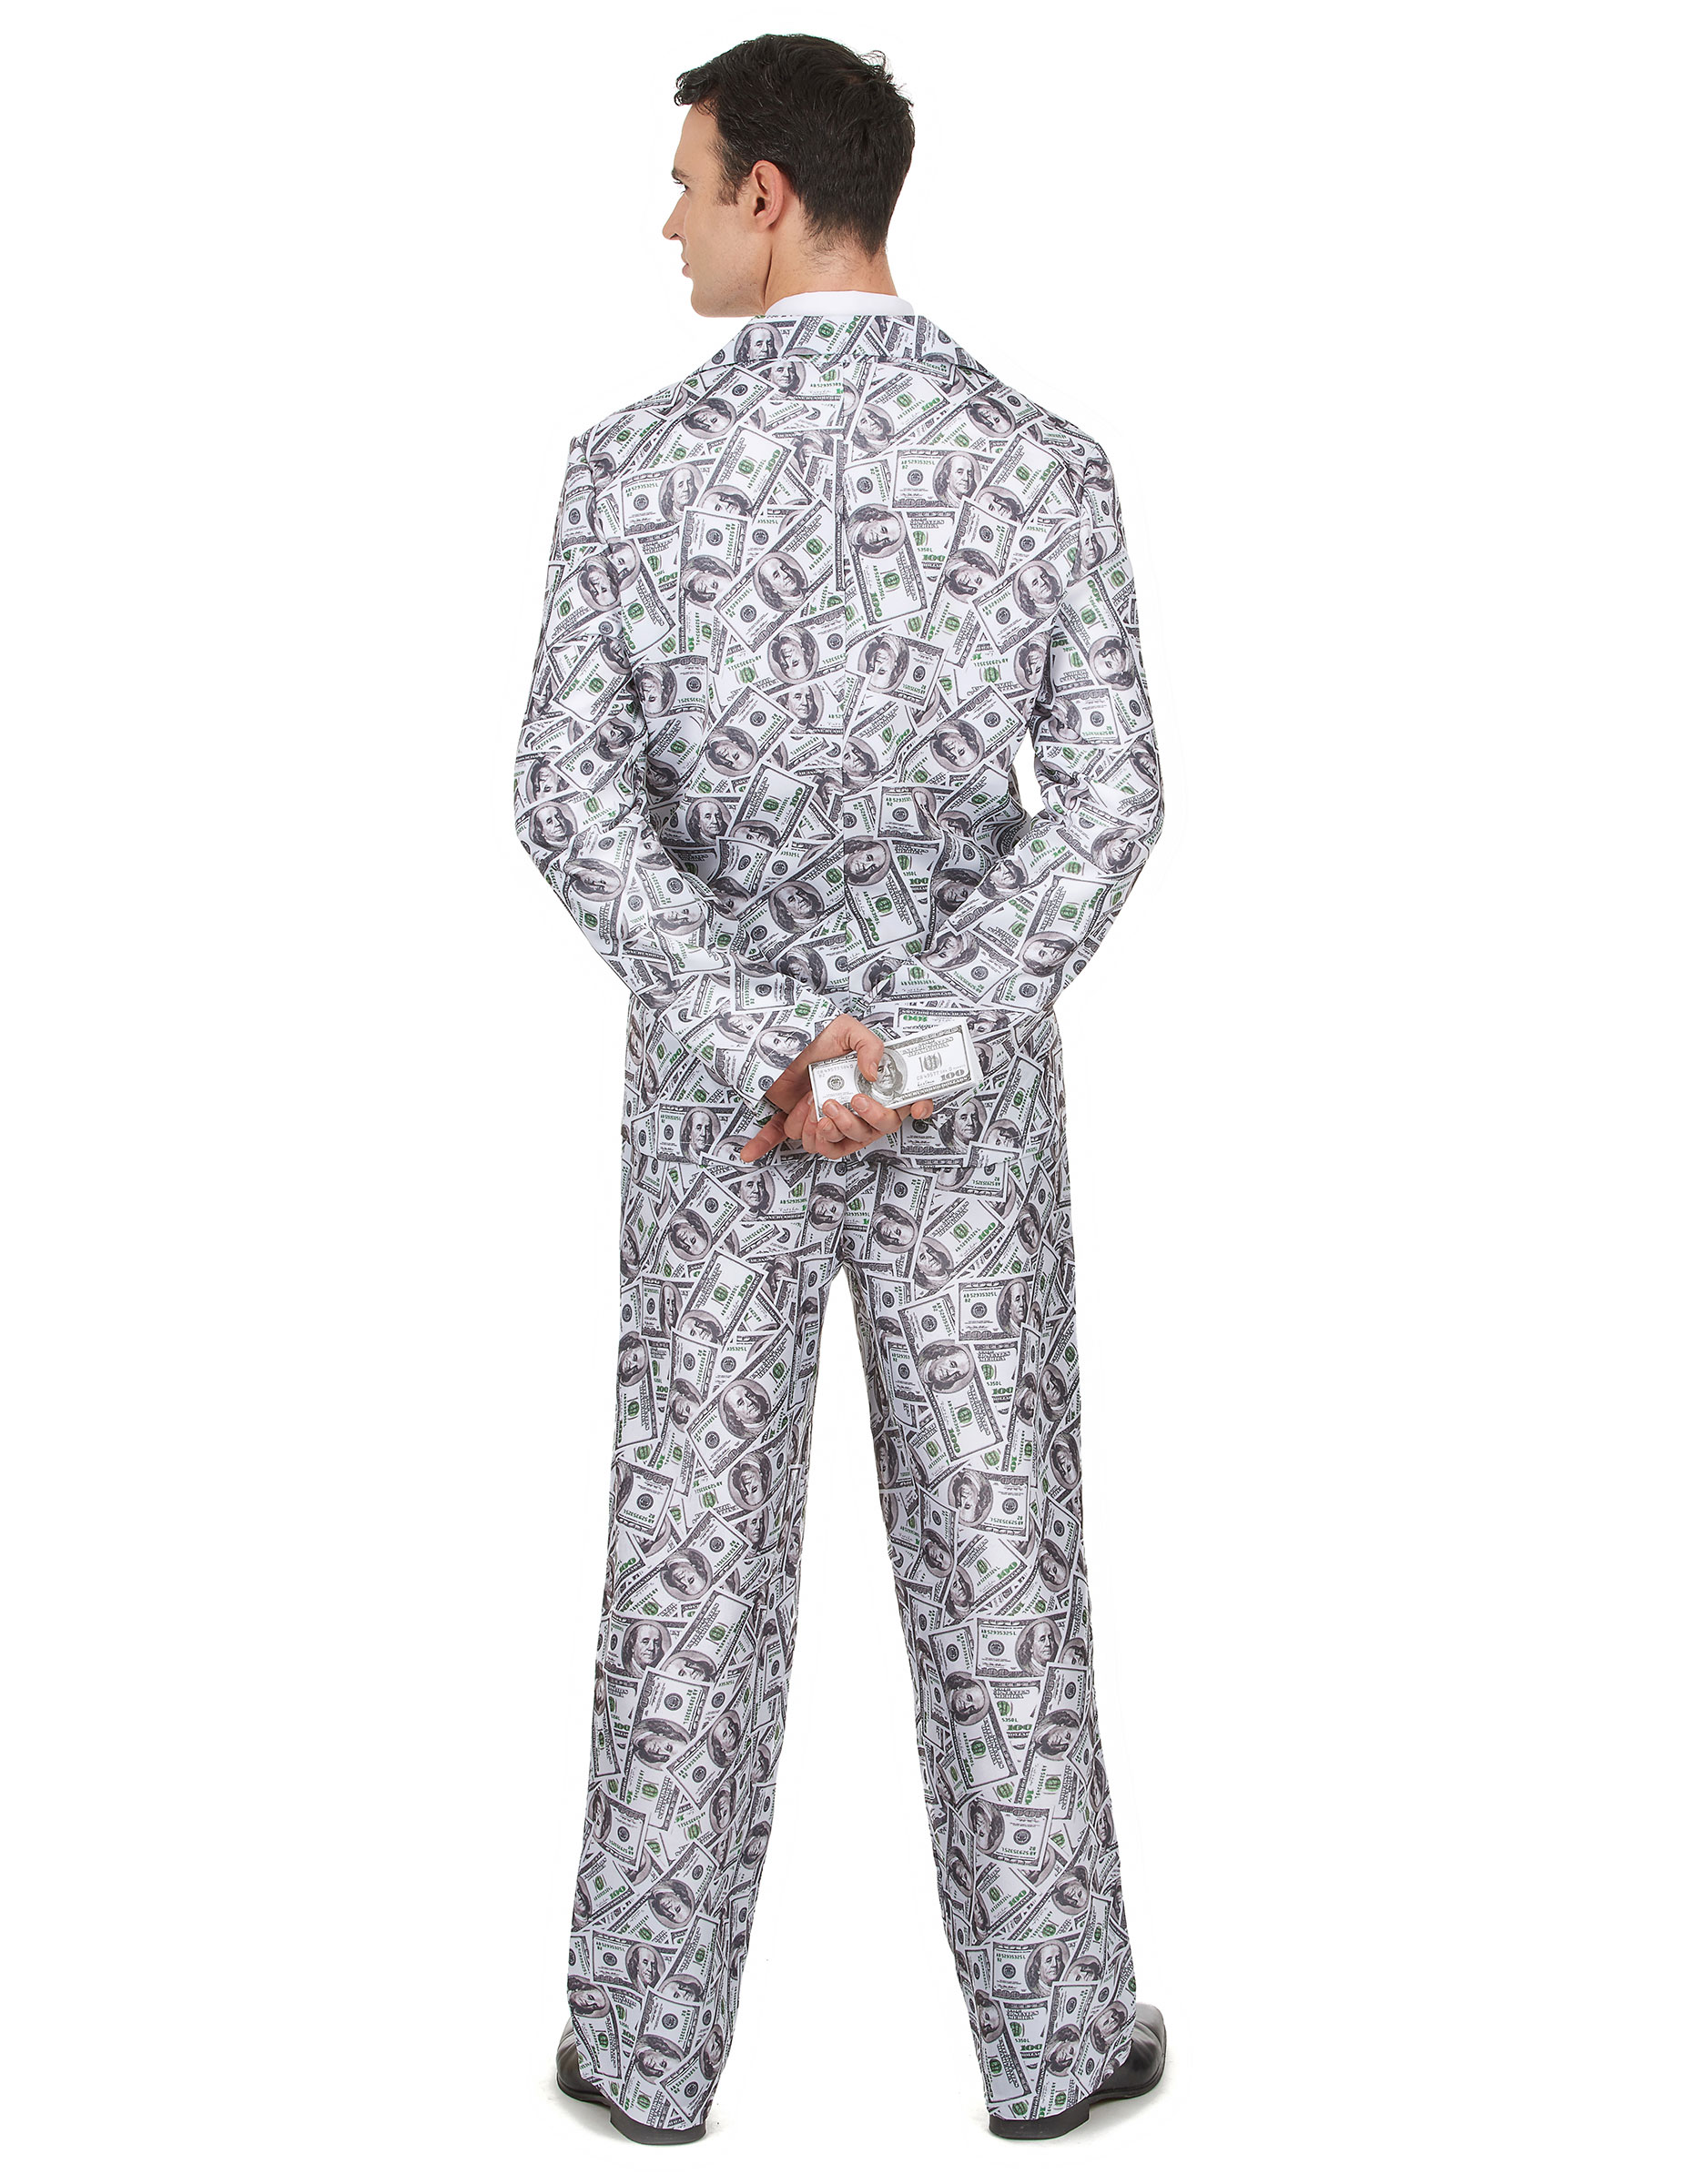 geldschein anzug dollar mann kost m weiss grau gr n g nstige faschings kost me bei karneval. Black Bedroom Furniture Sets. Home Design Ideas